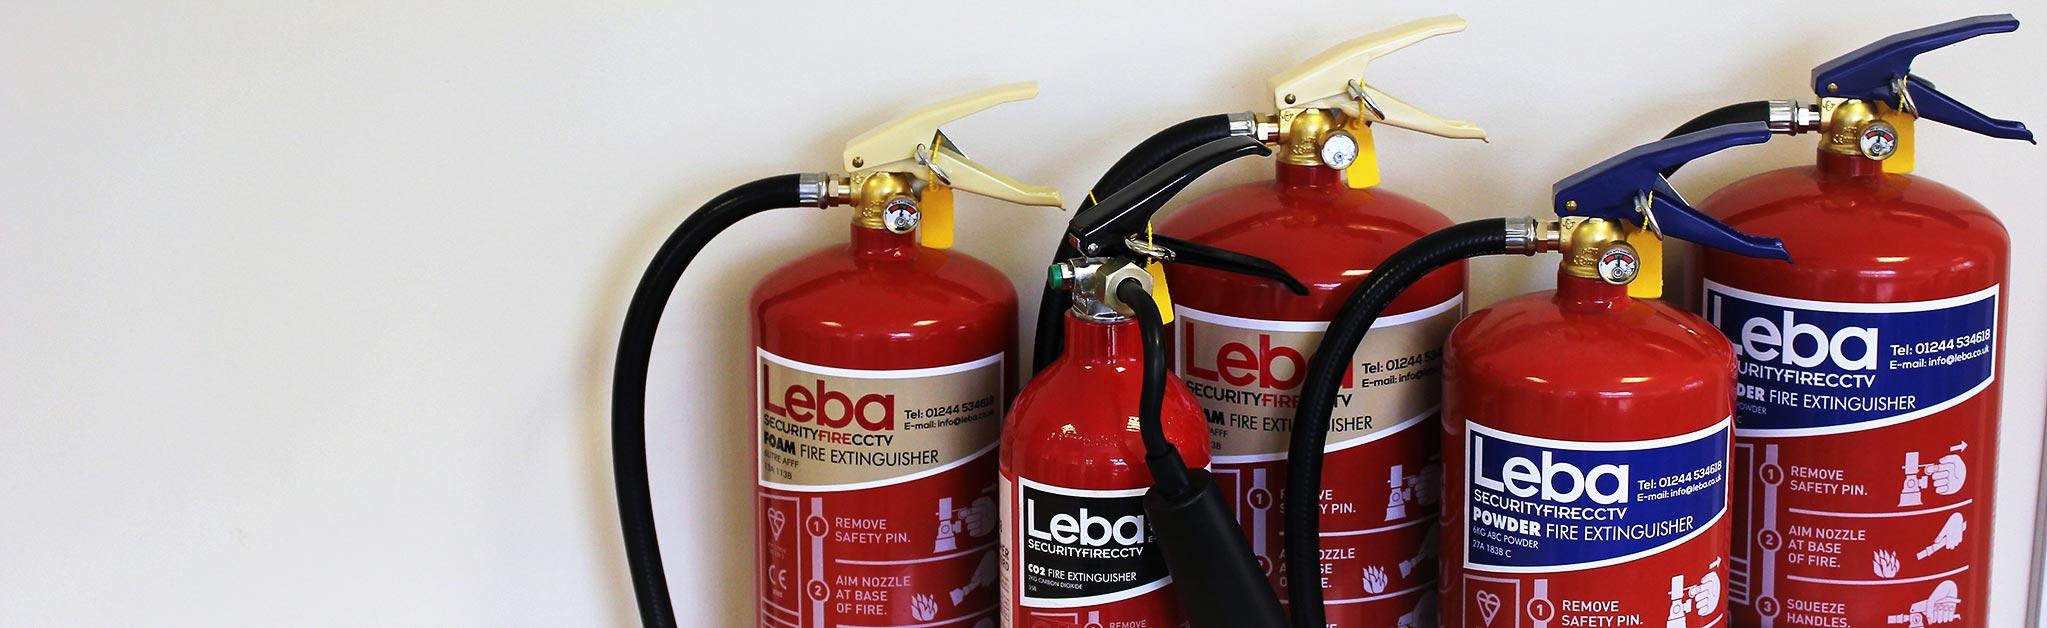 http://leba.co.uk/uploads/images/head-slides/Slide_Fire-Extinguishers.jpg